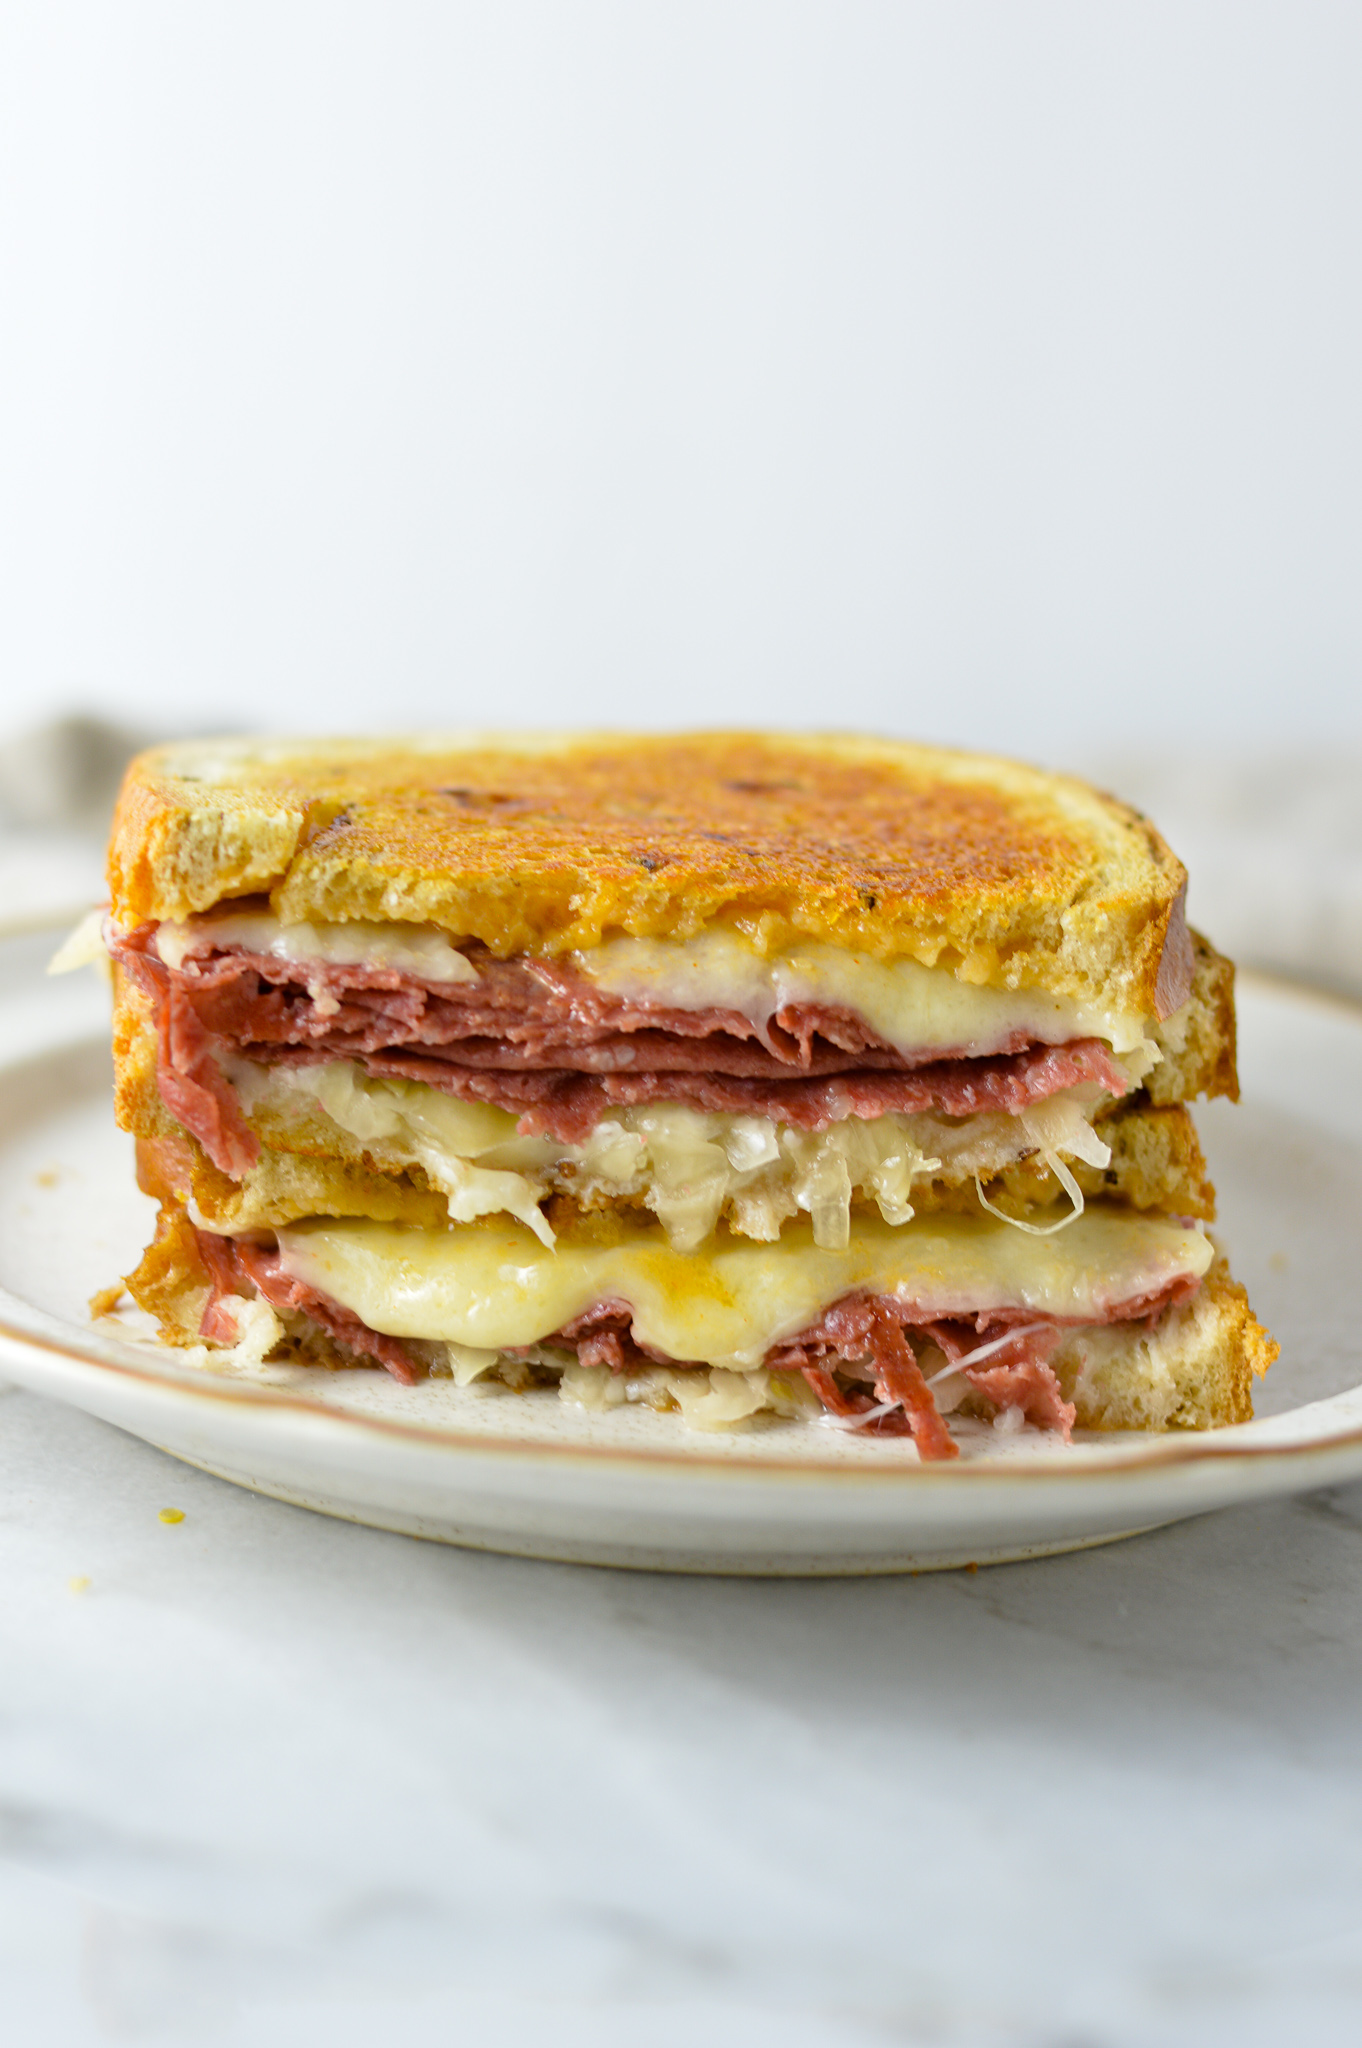 Reuben Sandwich A Taste Of Madness